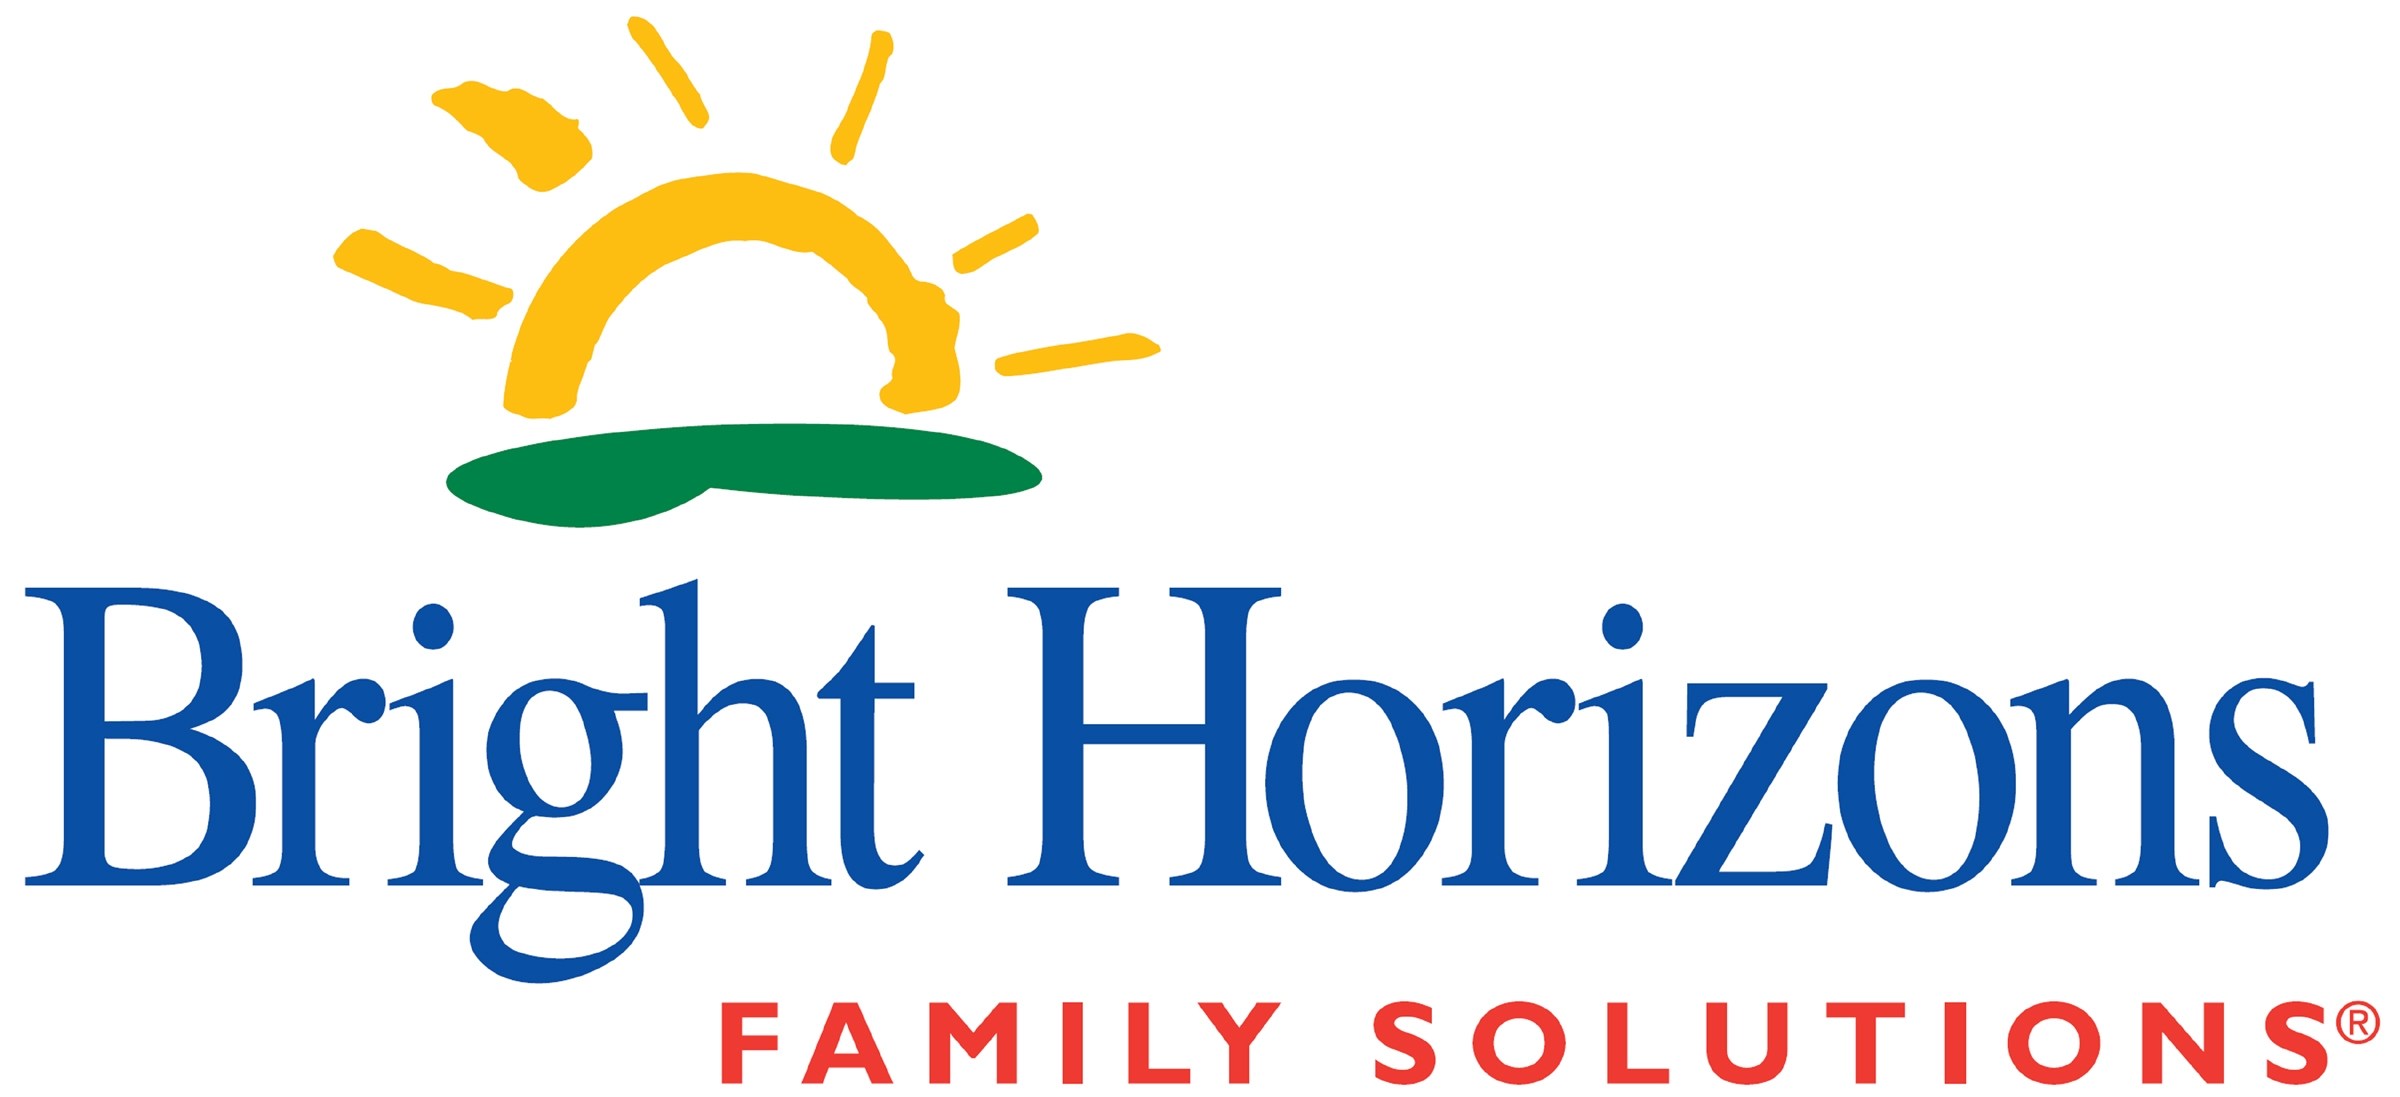 Bright Horizons Clipart.